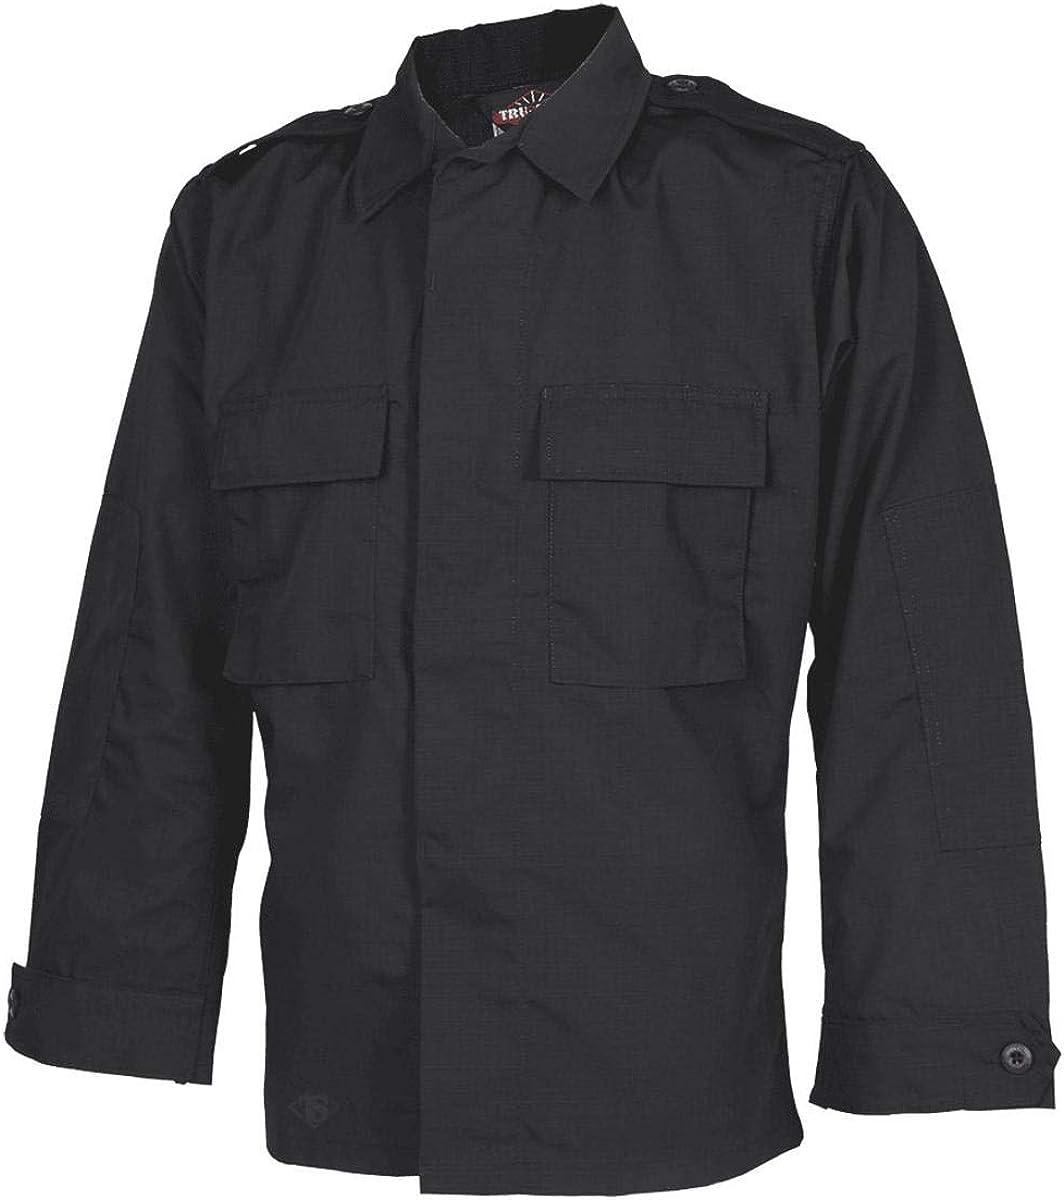 Tru-Spec Long-Sleeve Tactical Shirt Cheap SALE Start Poly-Cotton Ripstop M- Beauty products Black